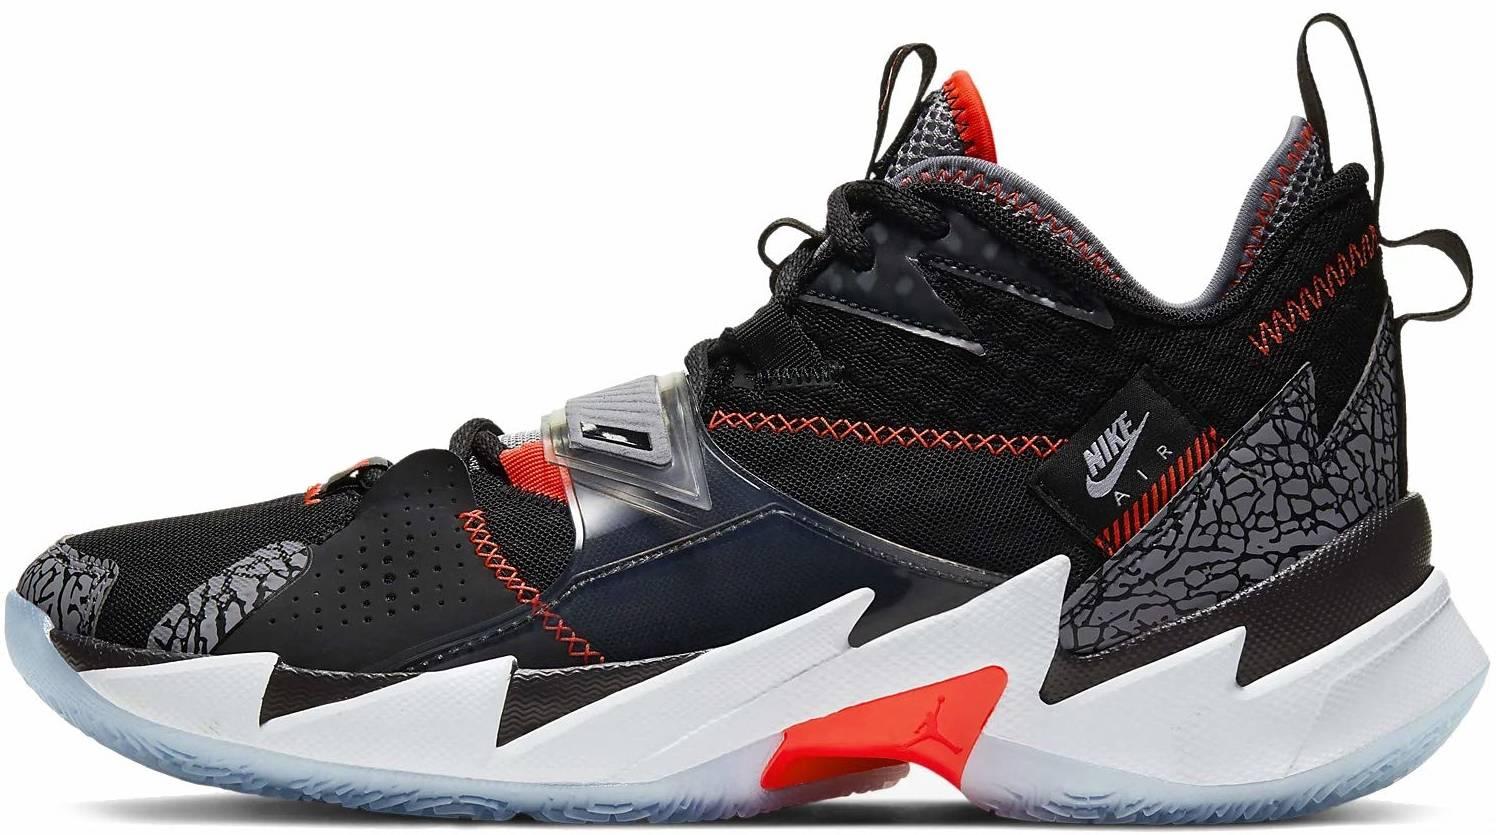 90 Jordan basketball shoes - Save 9% | RunRepeat